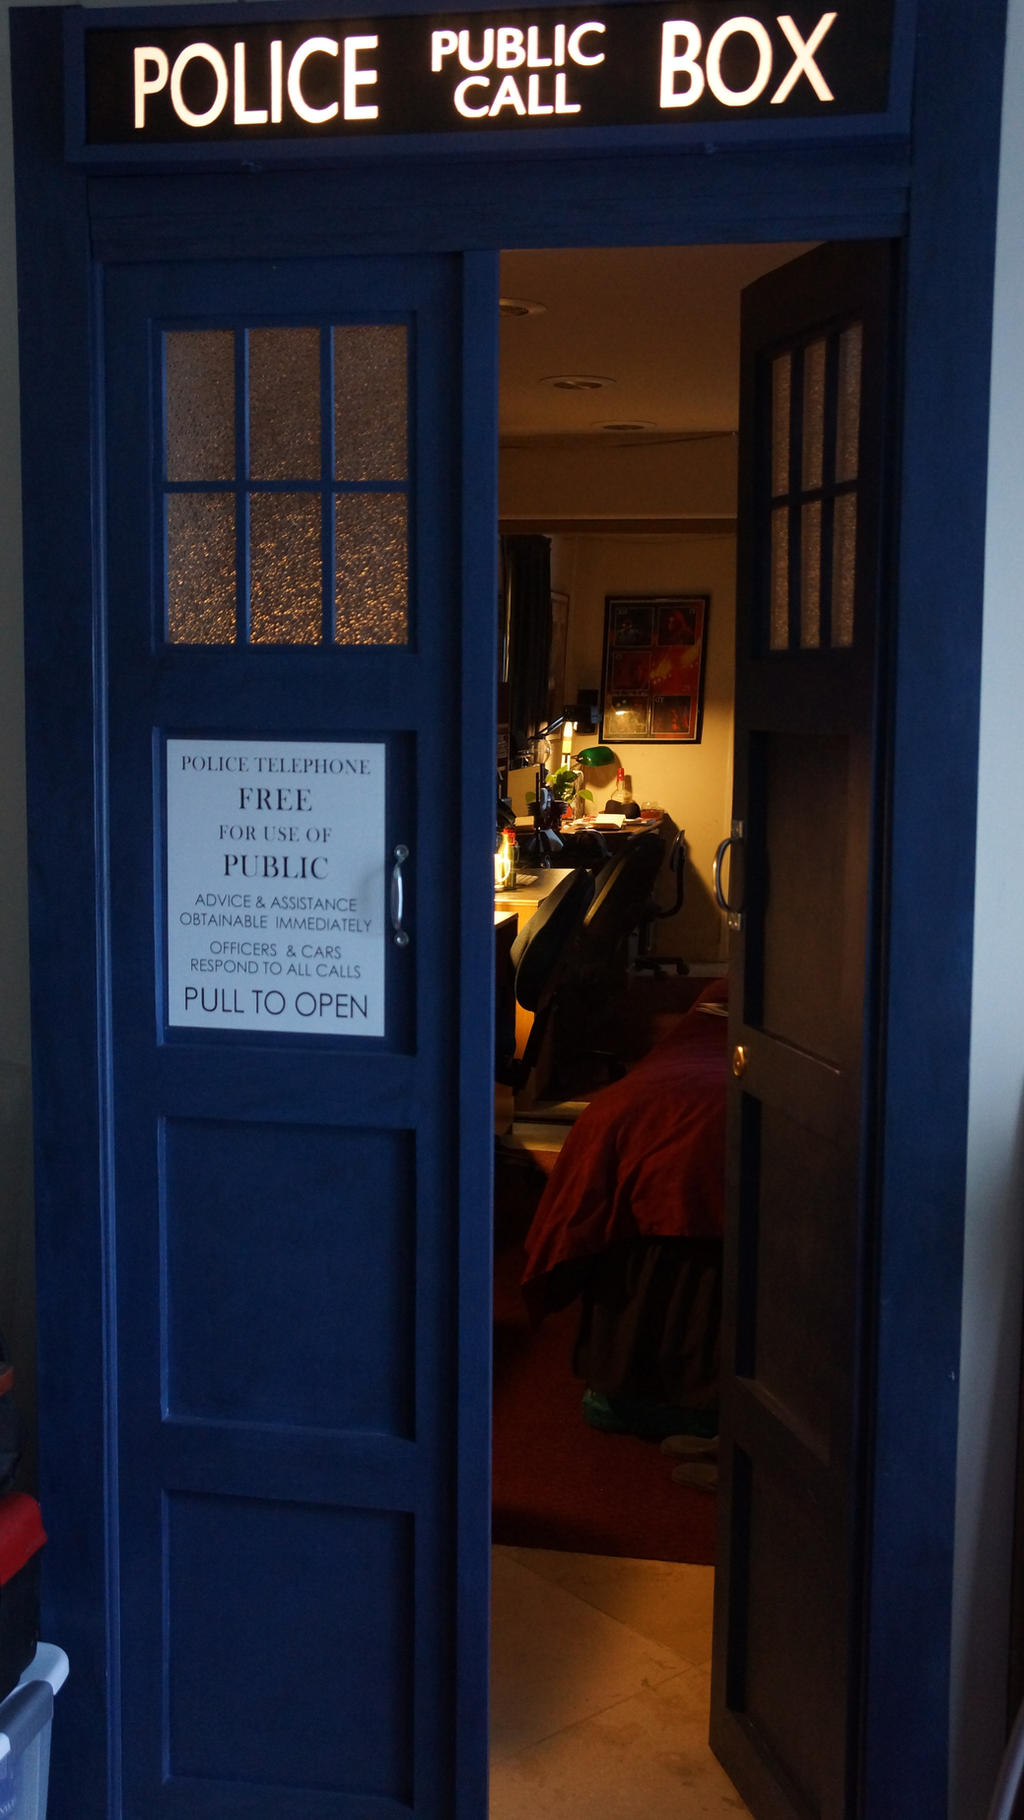 tardis bedroom door by thedaleofthedead on deviantart a titan eated my mom turned my sister s bedroom door